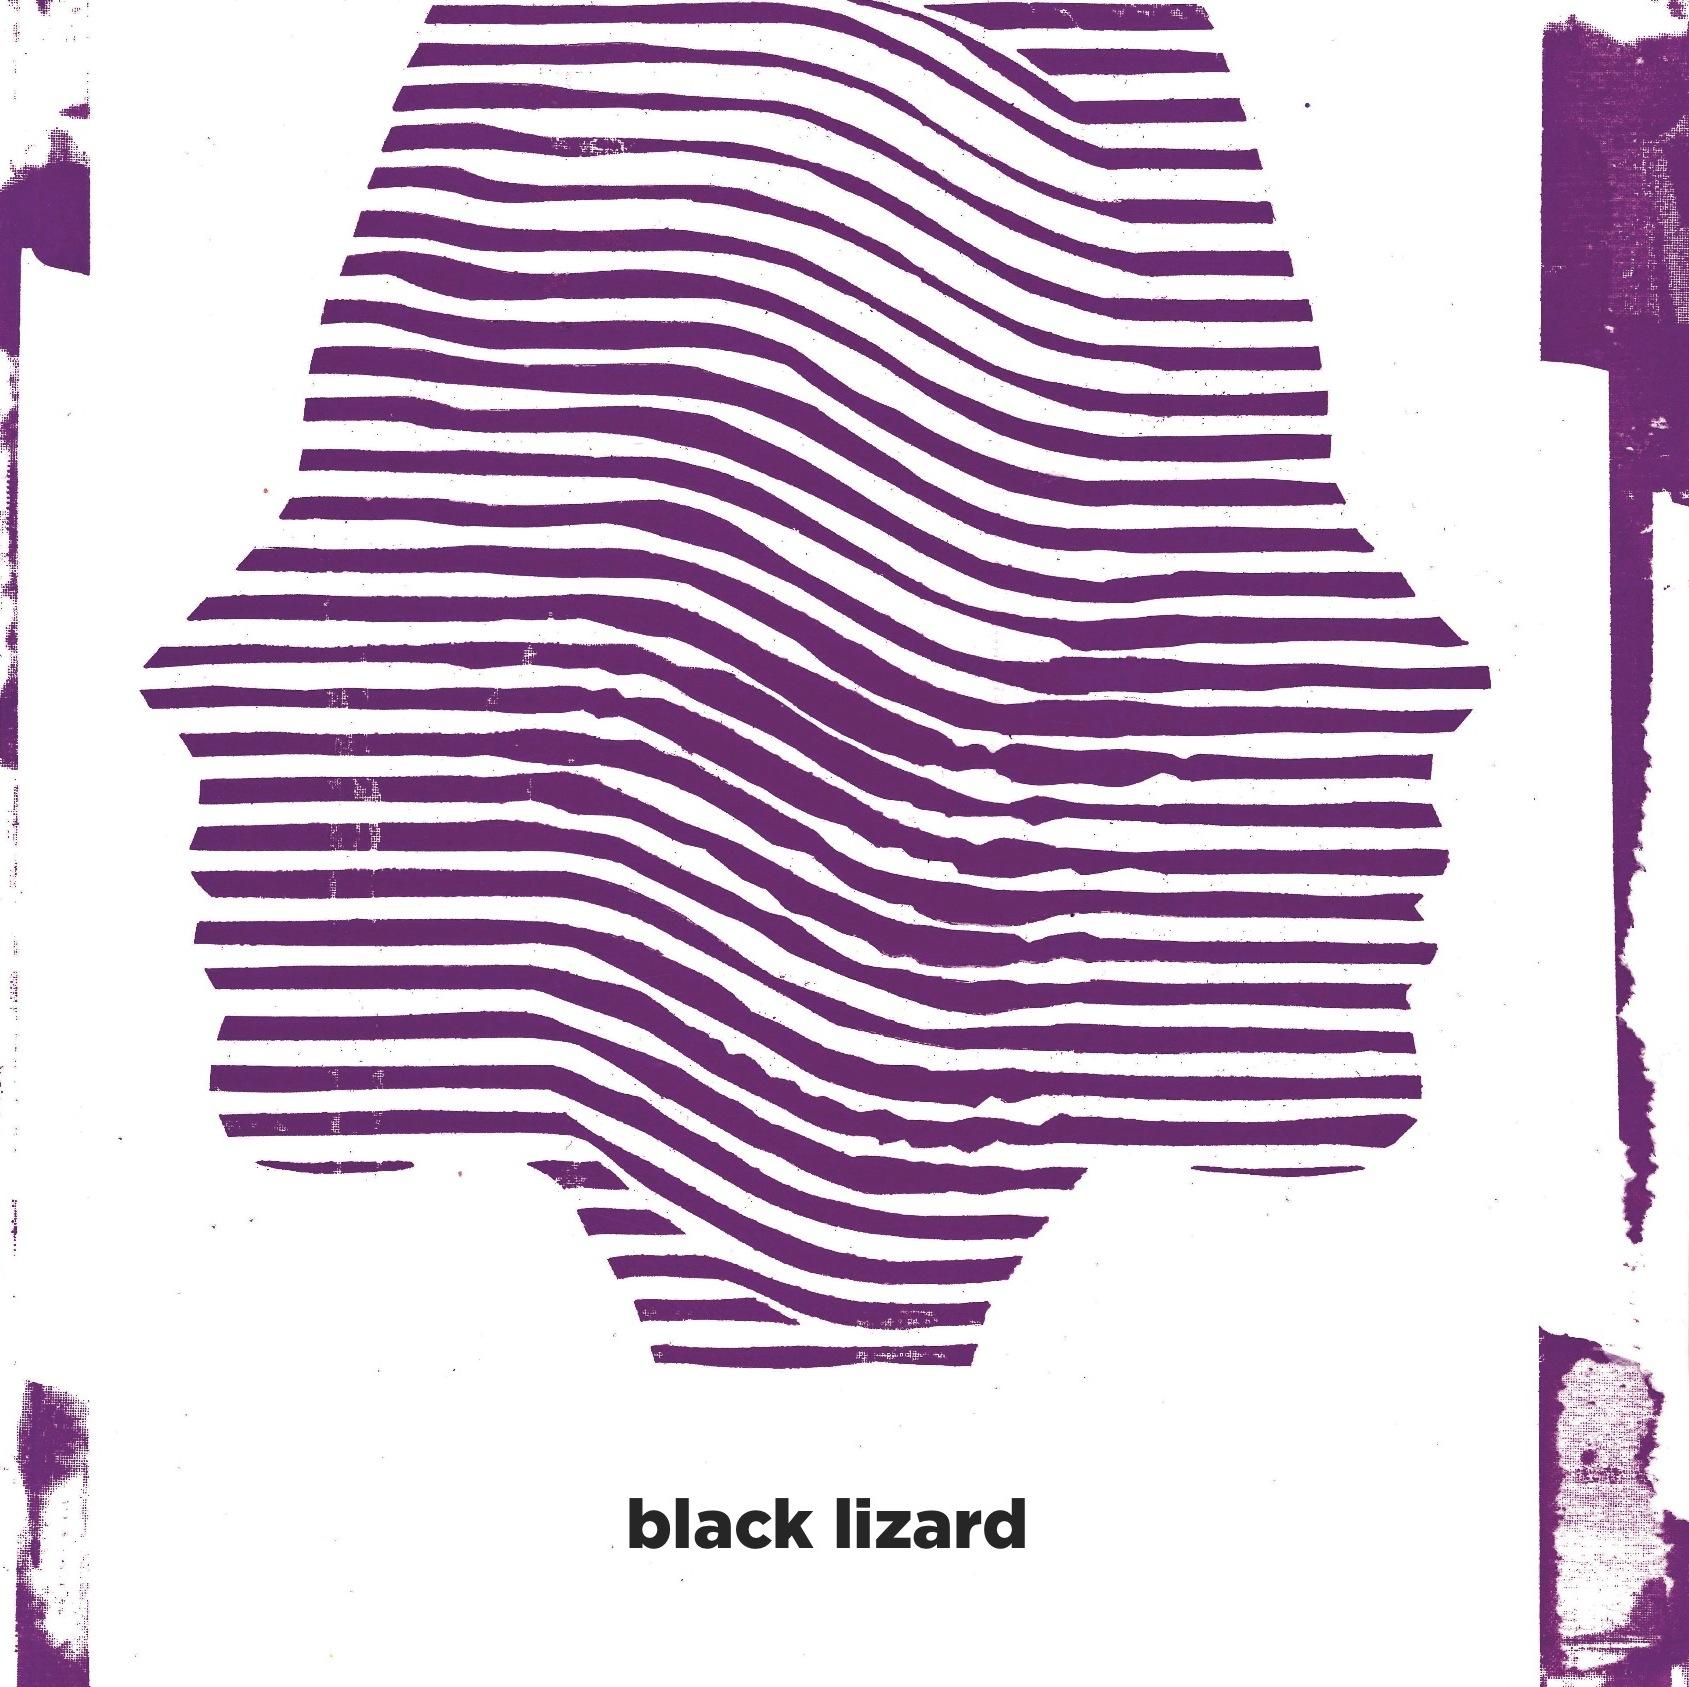 Resultado de imagem para black lizaRD black lizard soliti